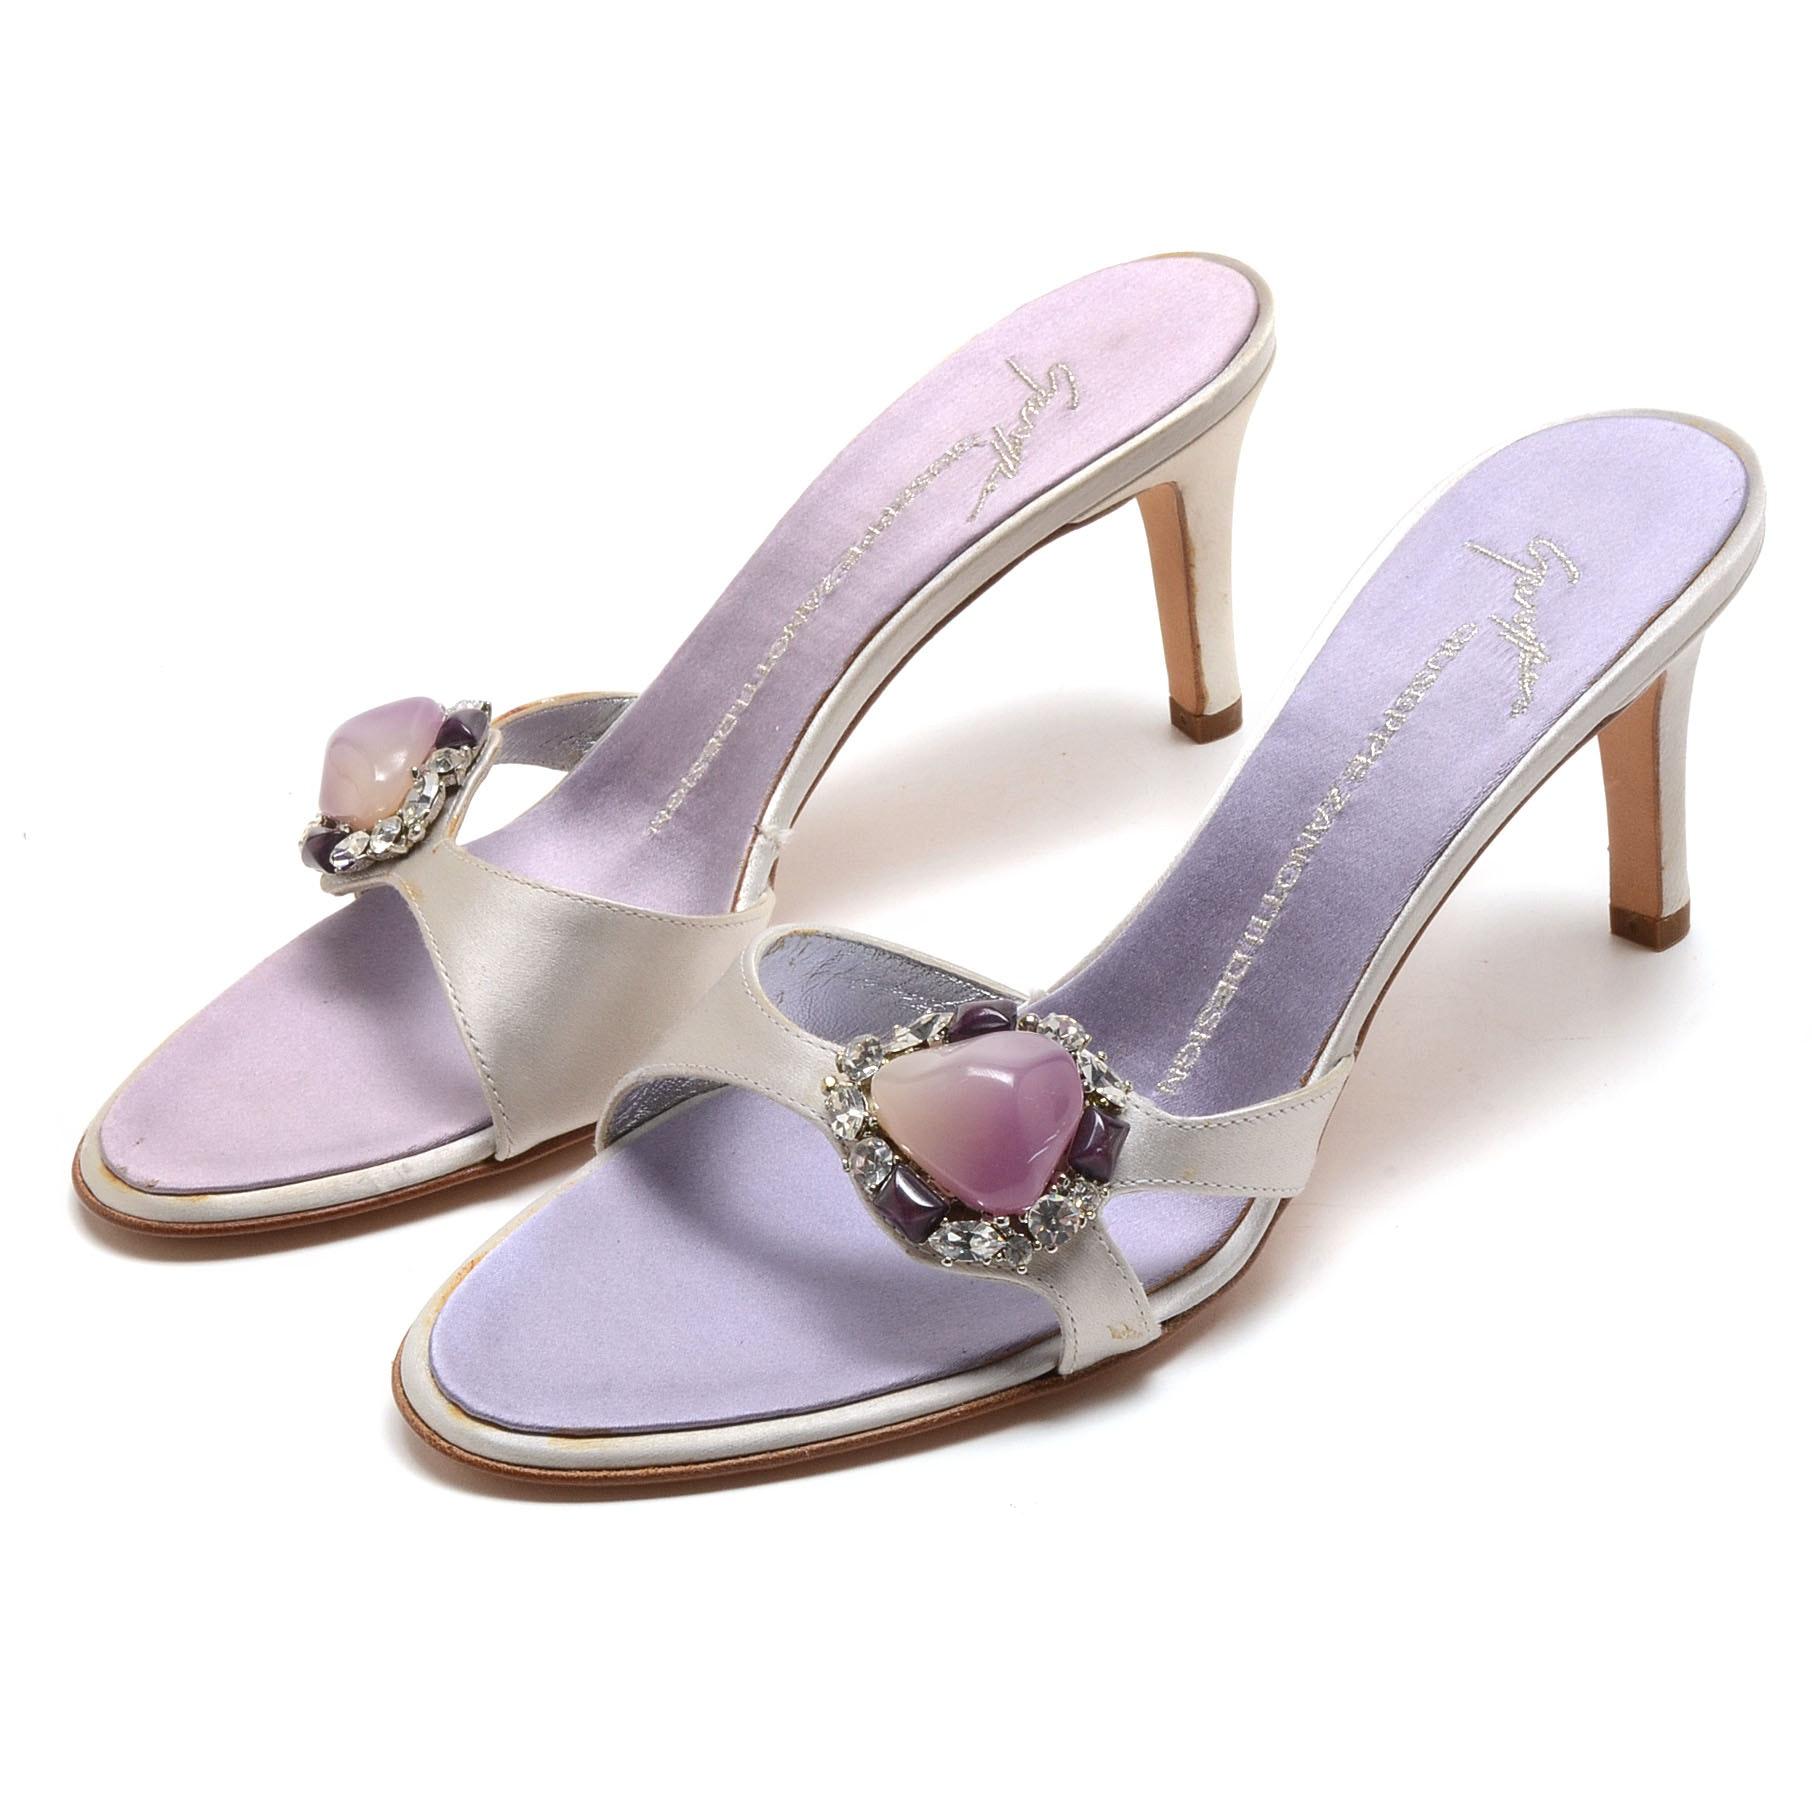 "Vicini Giuseppe Zanotti Design ""Doppiato"" Silver Silky Satin Embellished Slide Dress Sandals"